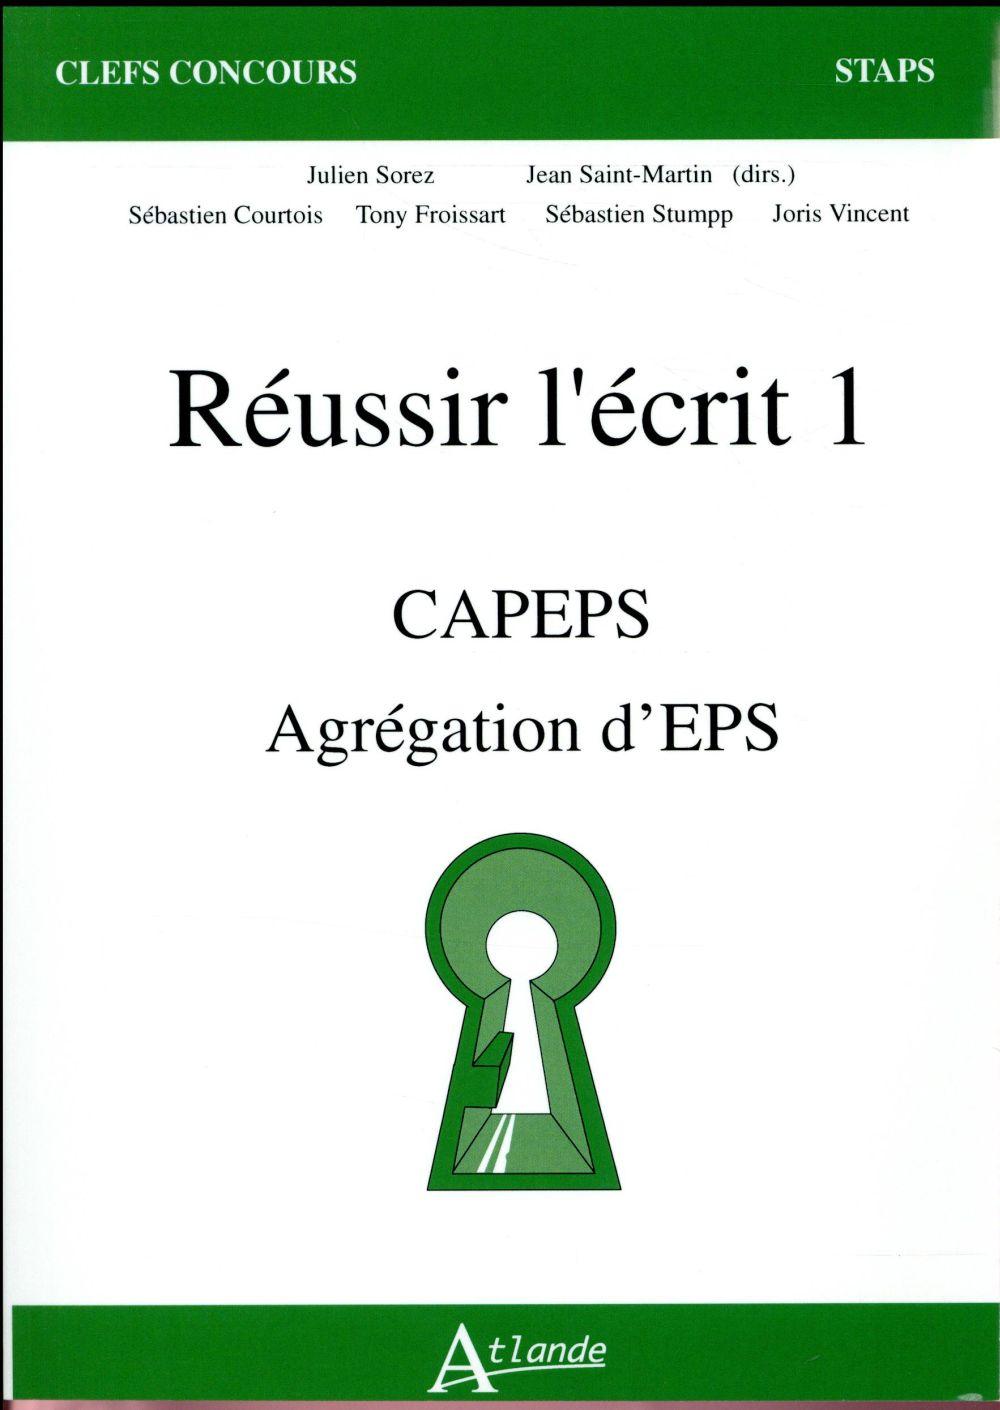 REUSSIR L'ECRIT 1 - CAPES, AGREGATION INTERNE D'EPS